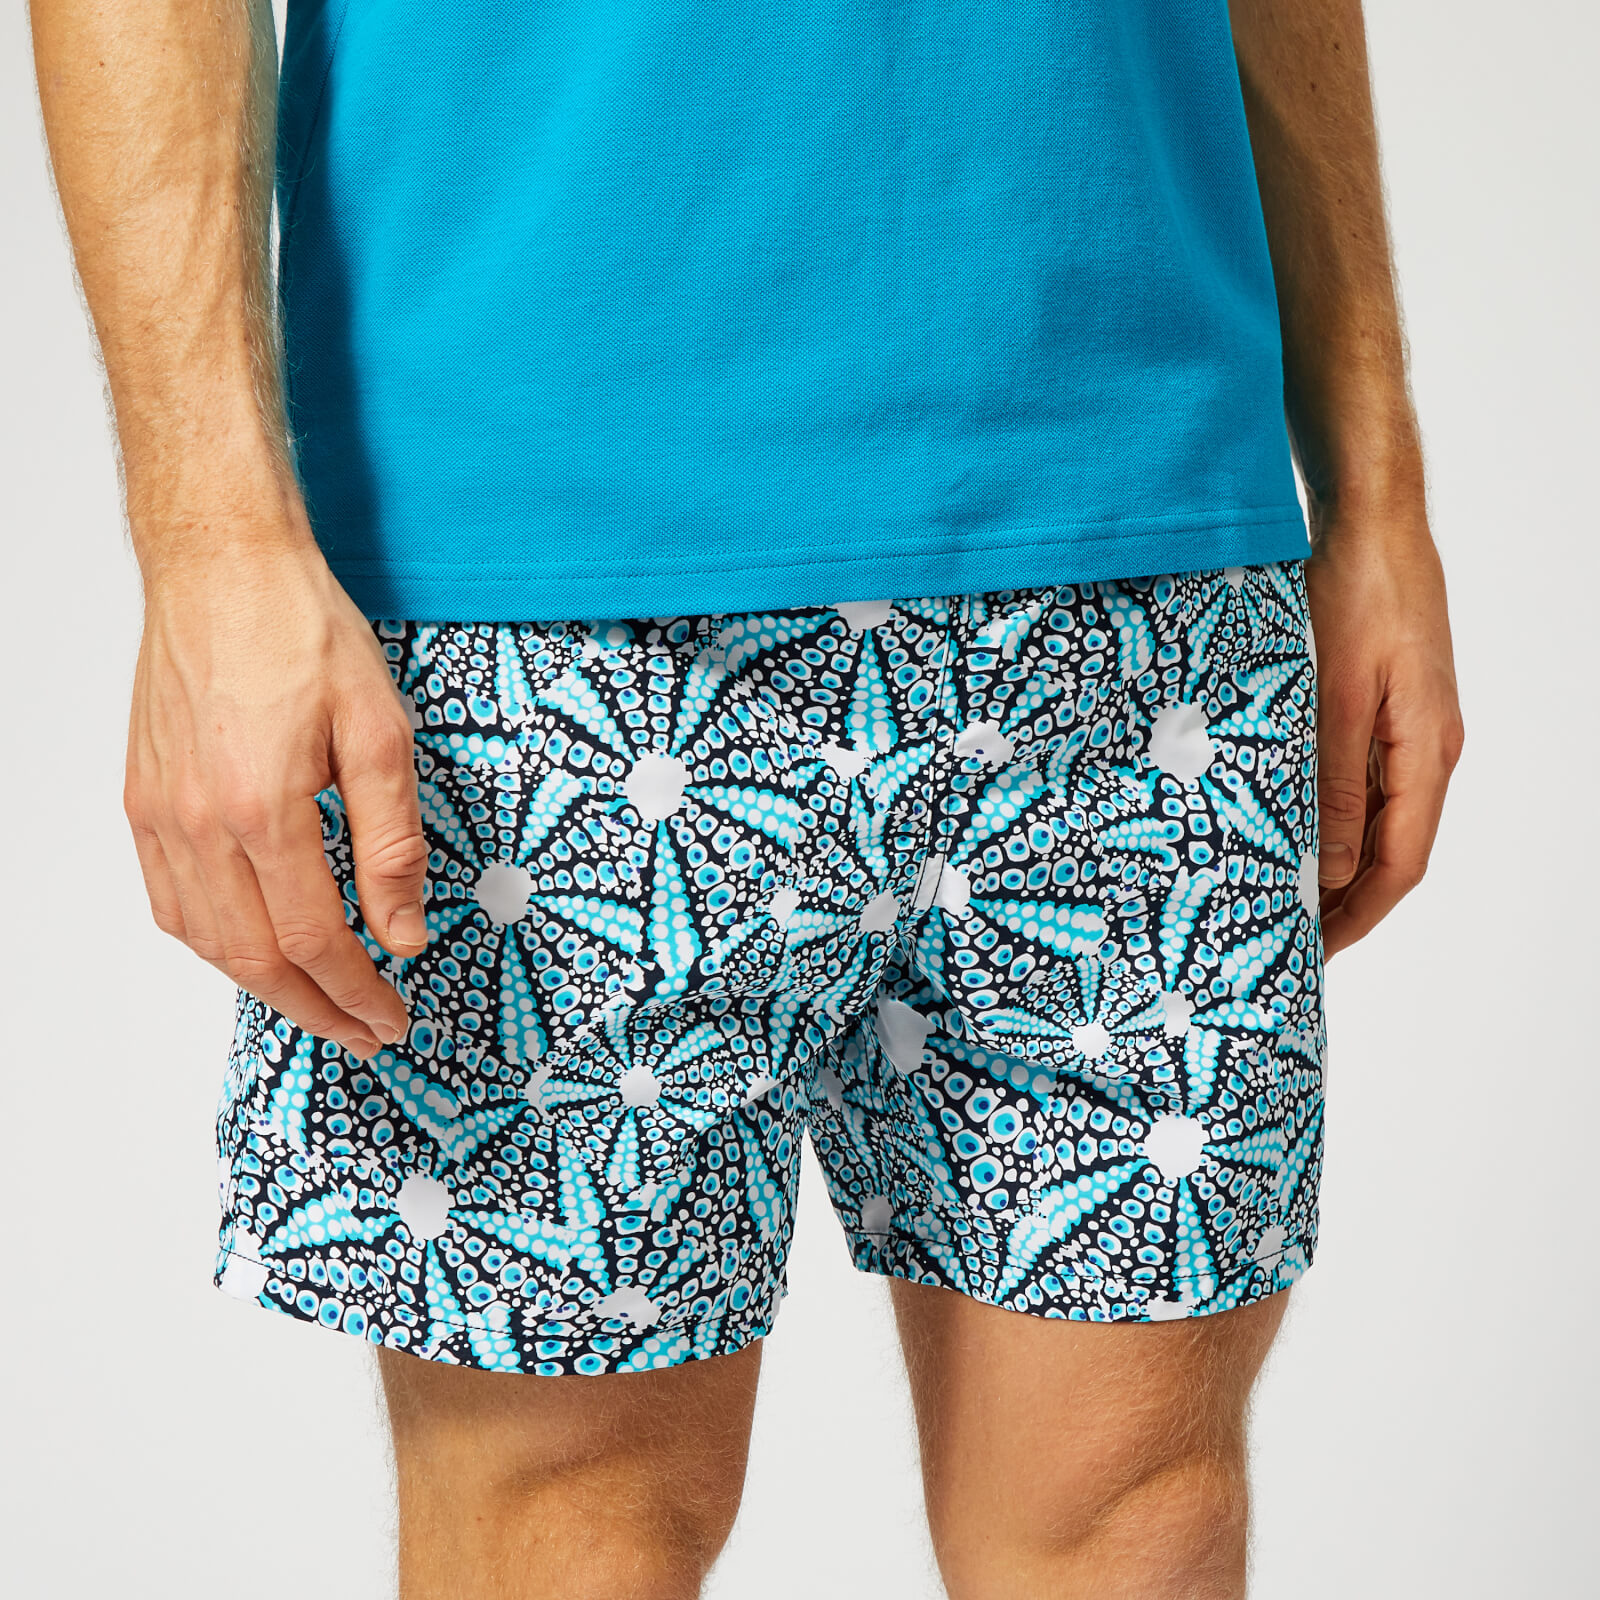 99f2ed00f1 Vilebrequin Men's Moorea Urchin Print Swim Shorts - Navy - Free UK Delivery  over £50